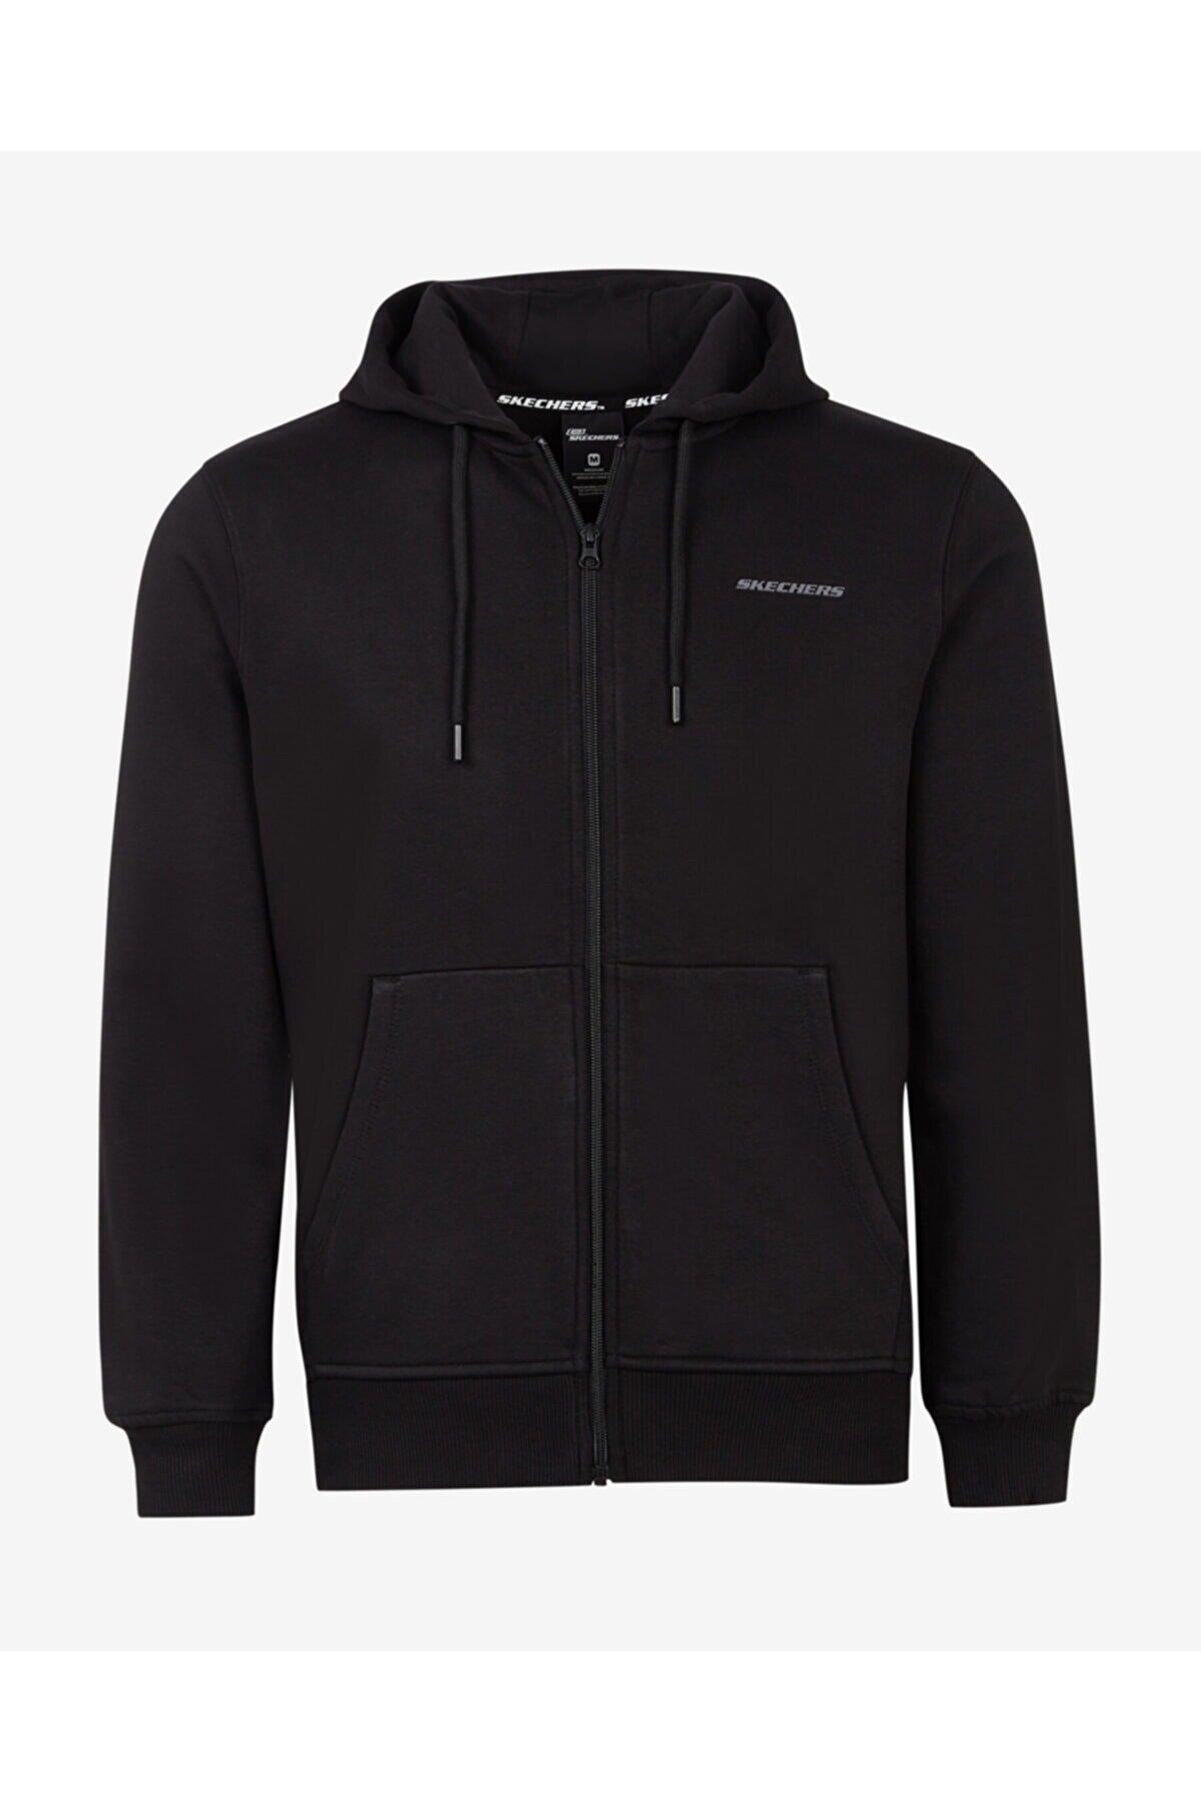 Skechers LW Fleece M Full Zip Jacket Erkek Siyah Fermuarlı Eşofman Üstü